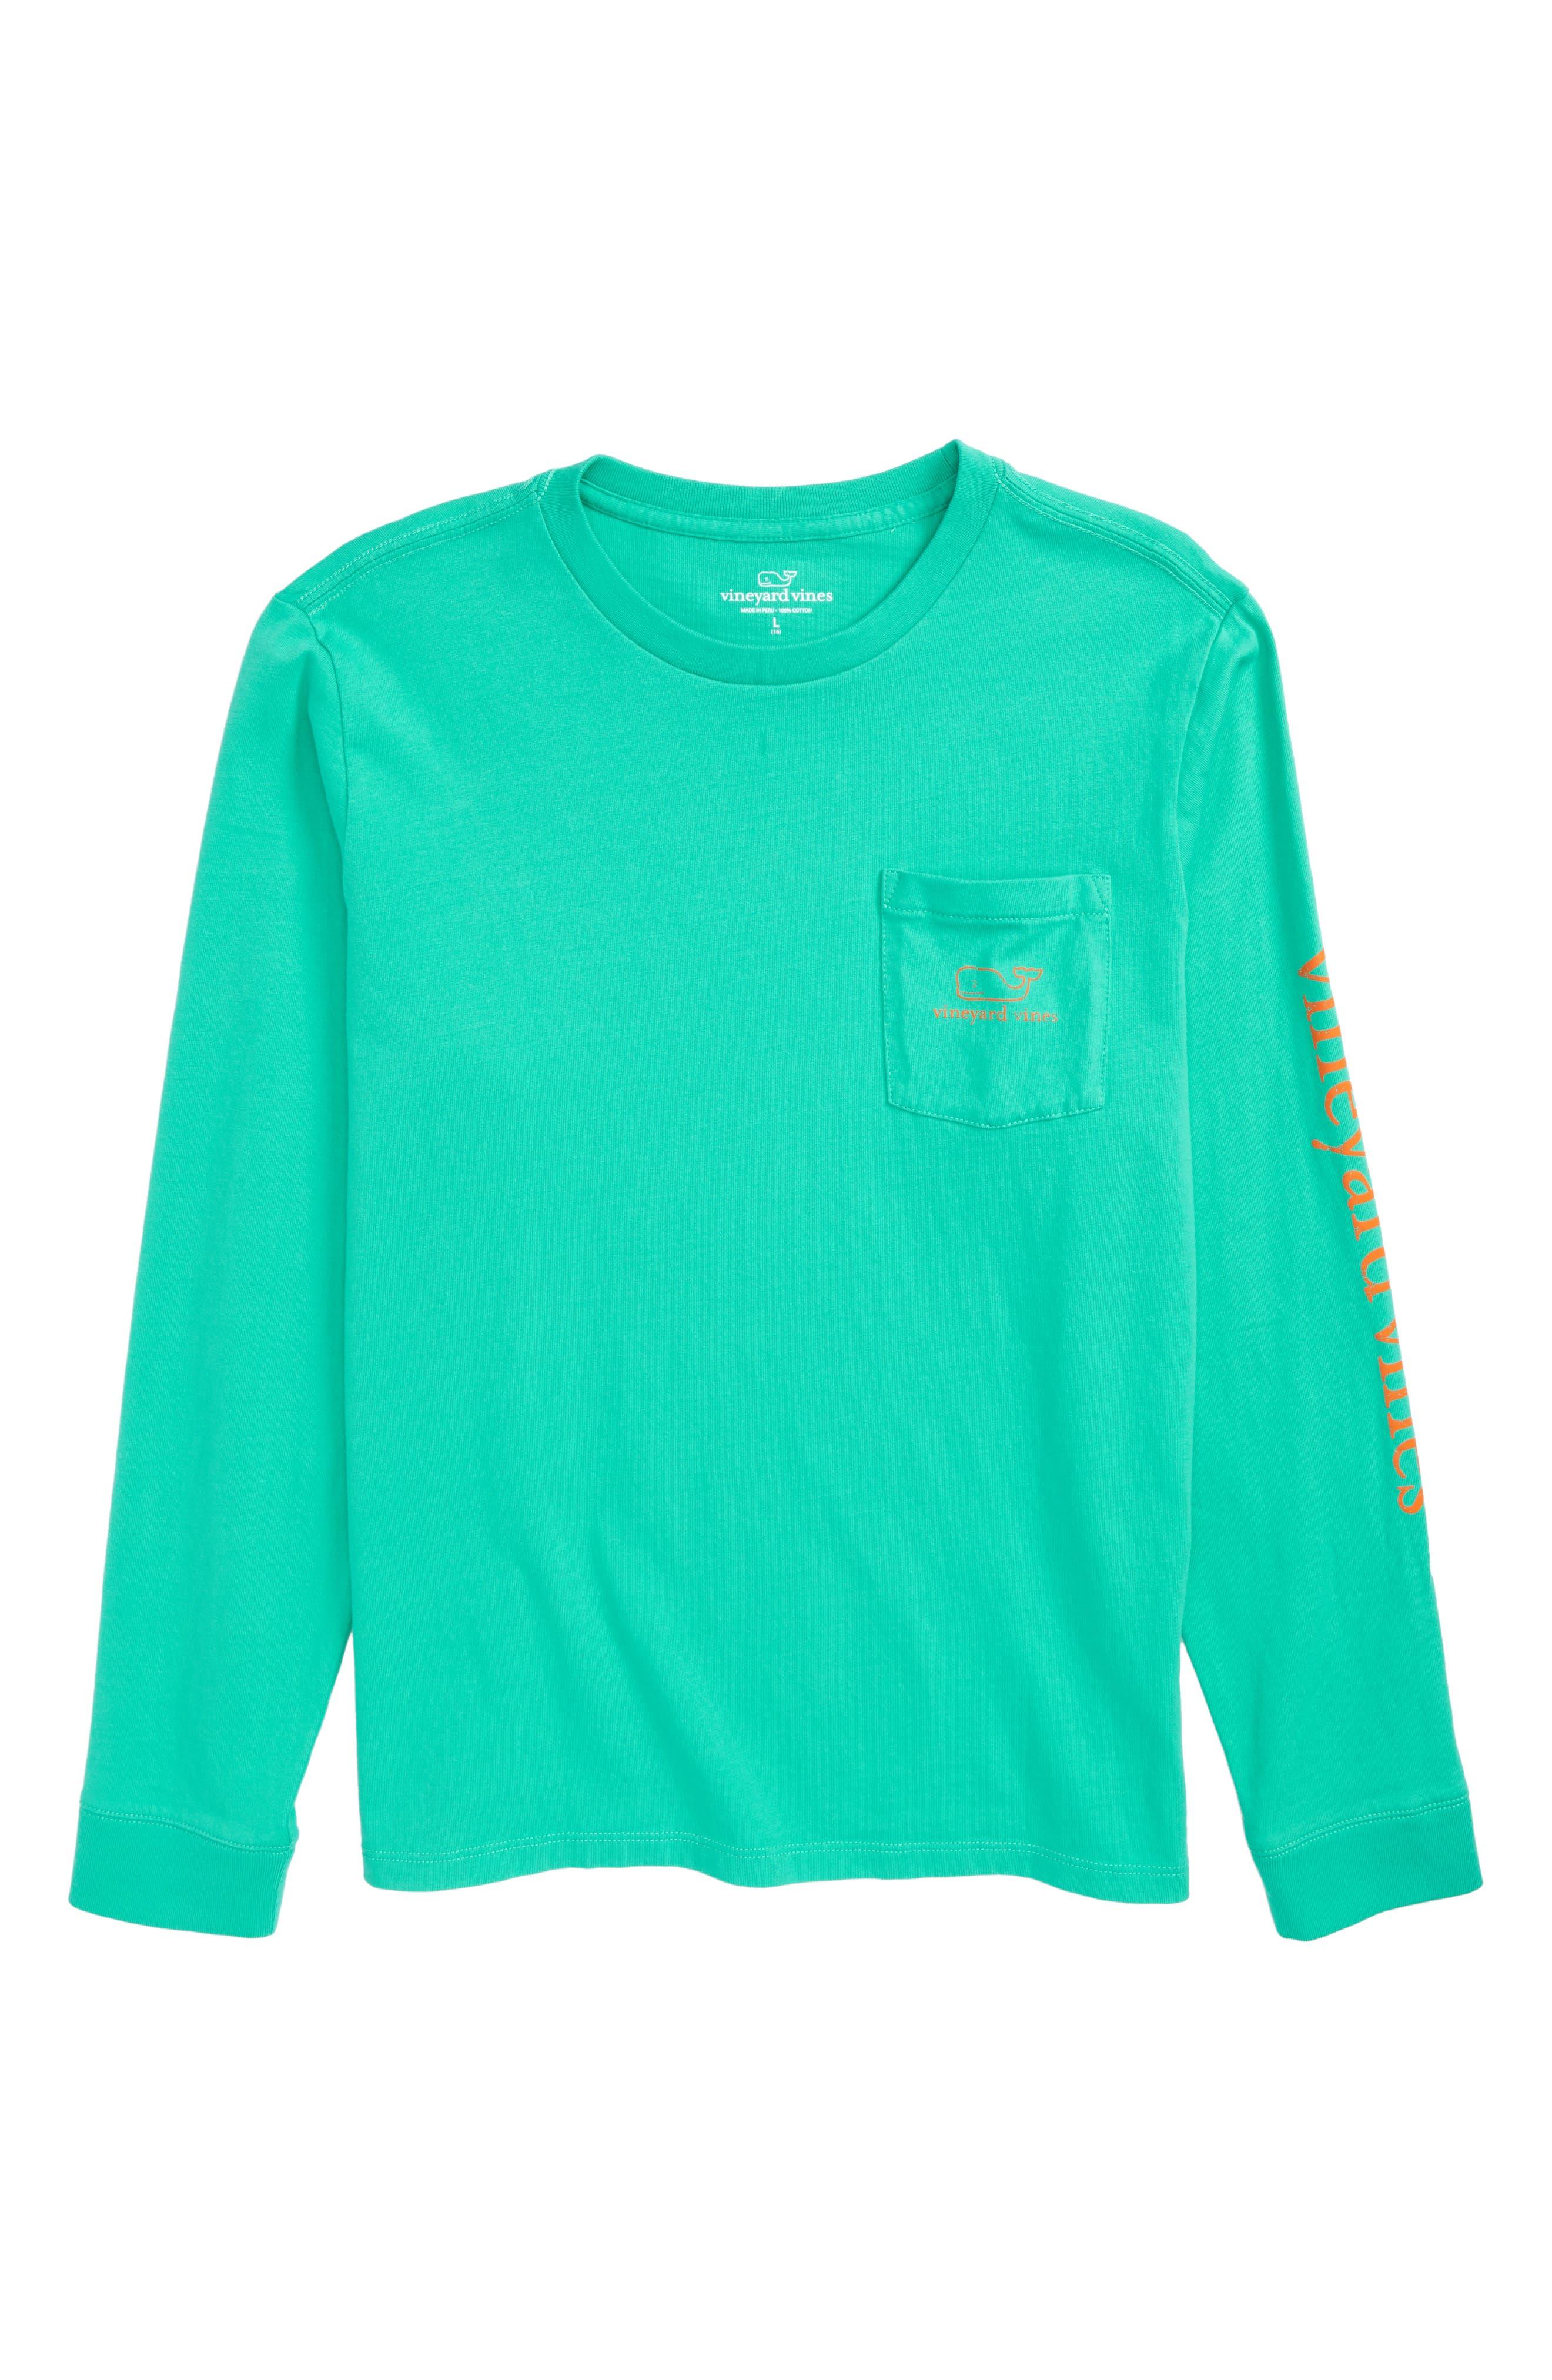 Vintage Whale Graphic Long Sleeve T-Shirt,                         Main,                         color, 386